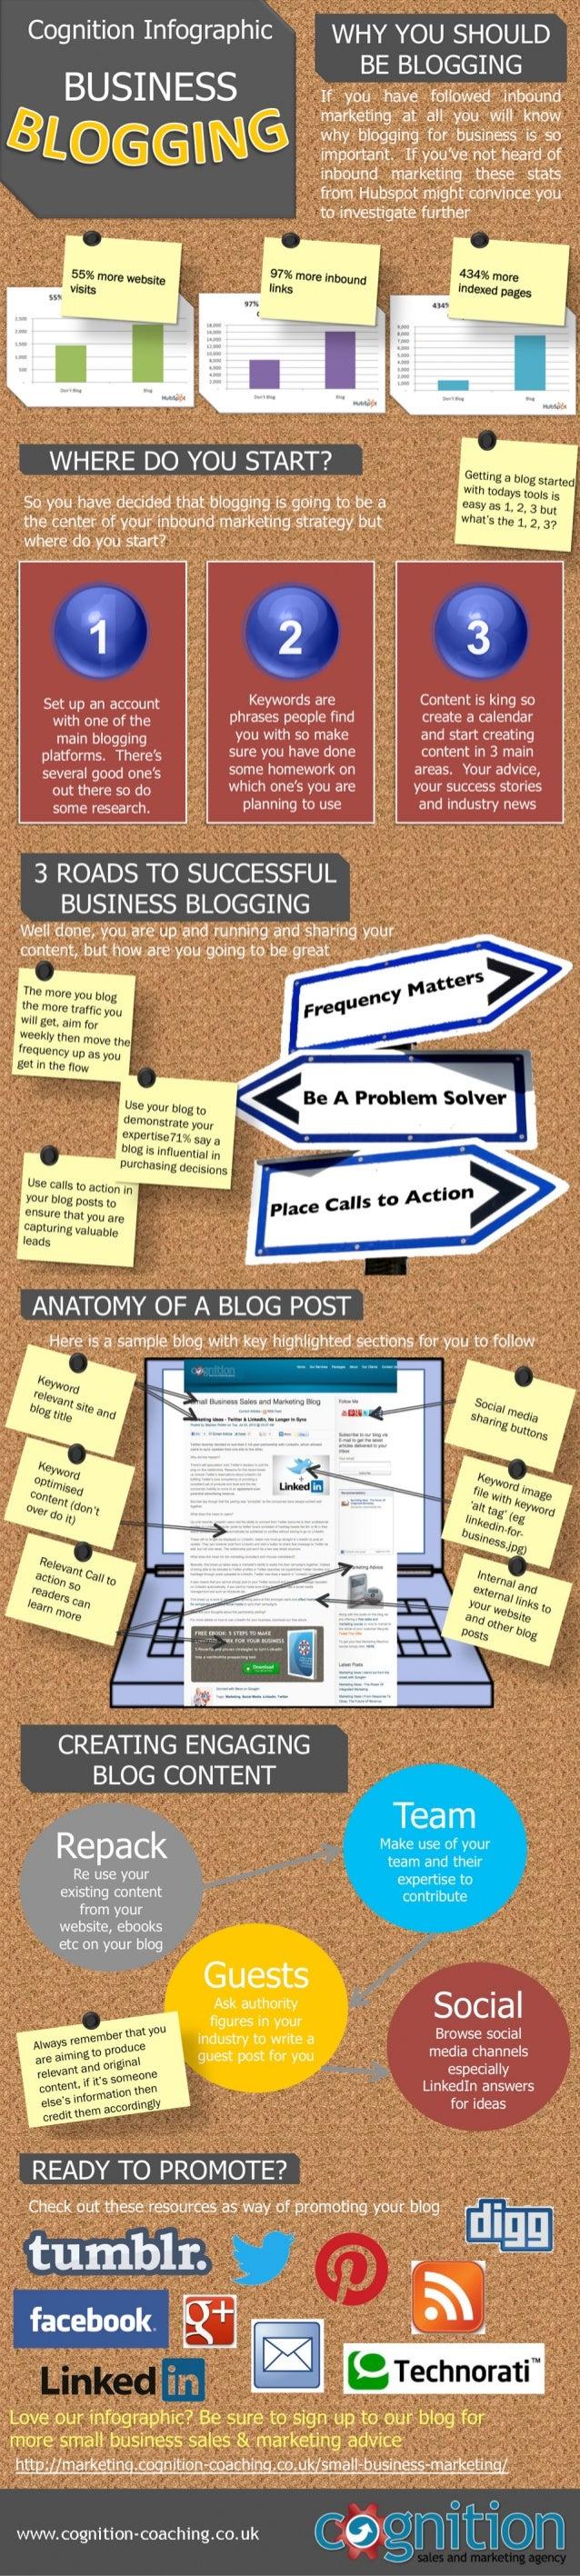 Business Blogging- (RAGHU)